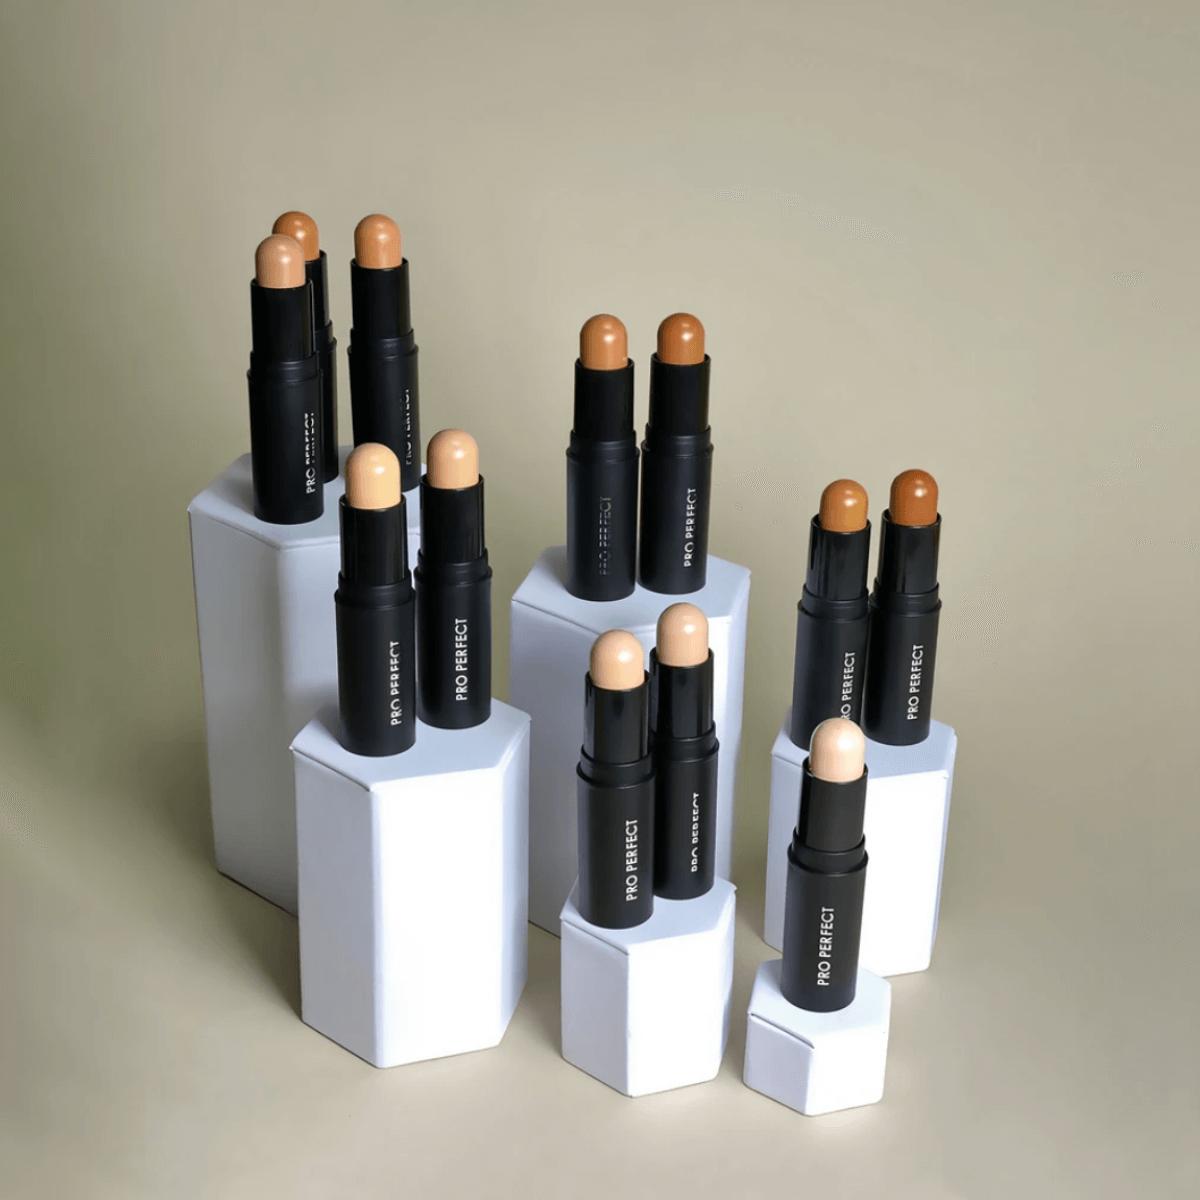 bodyography foundation sticks